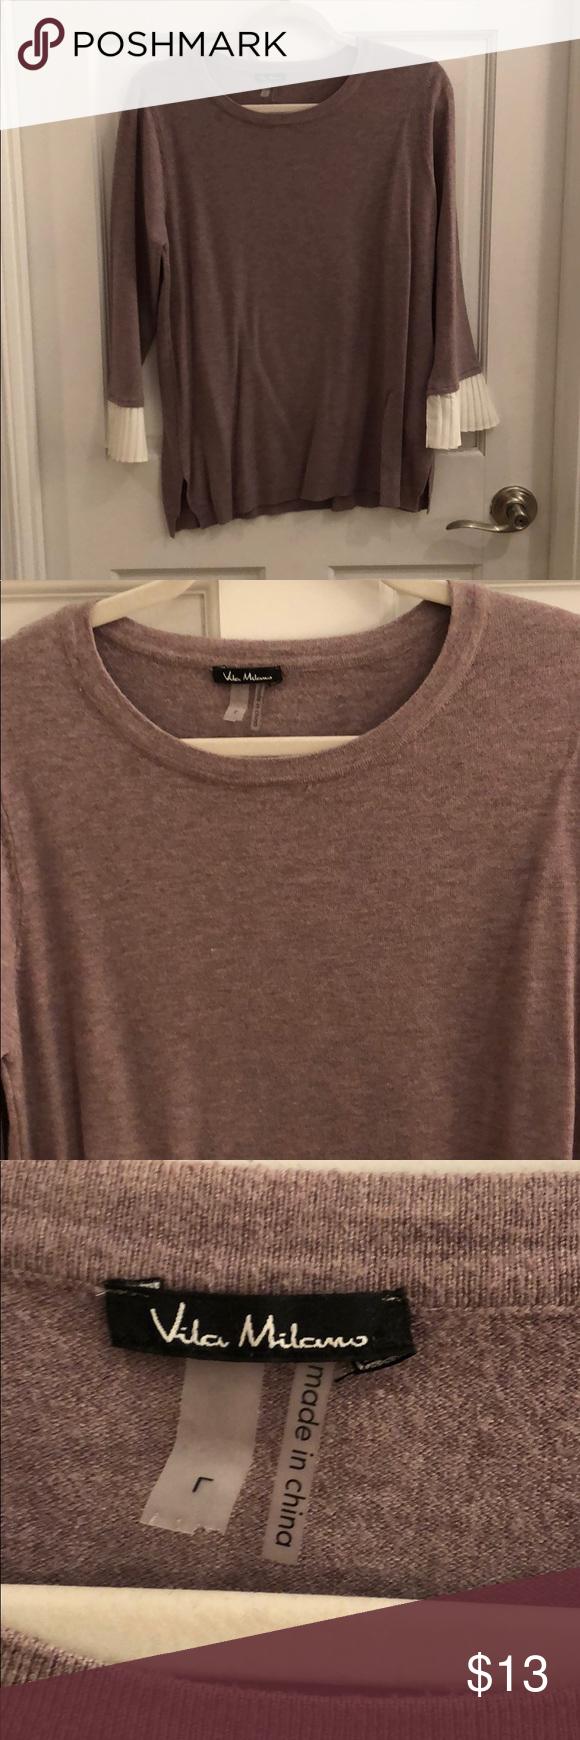 NWOT Vila Milano Pleat Sleeve Sweater L | Sweater sleeves